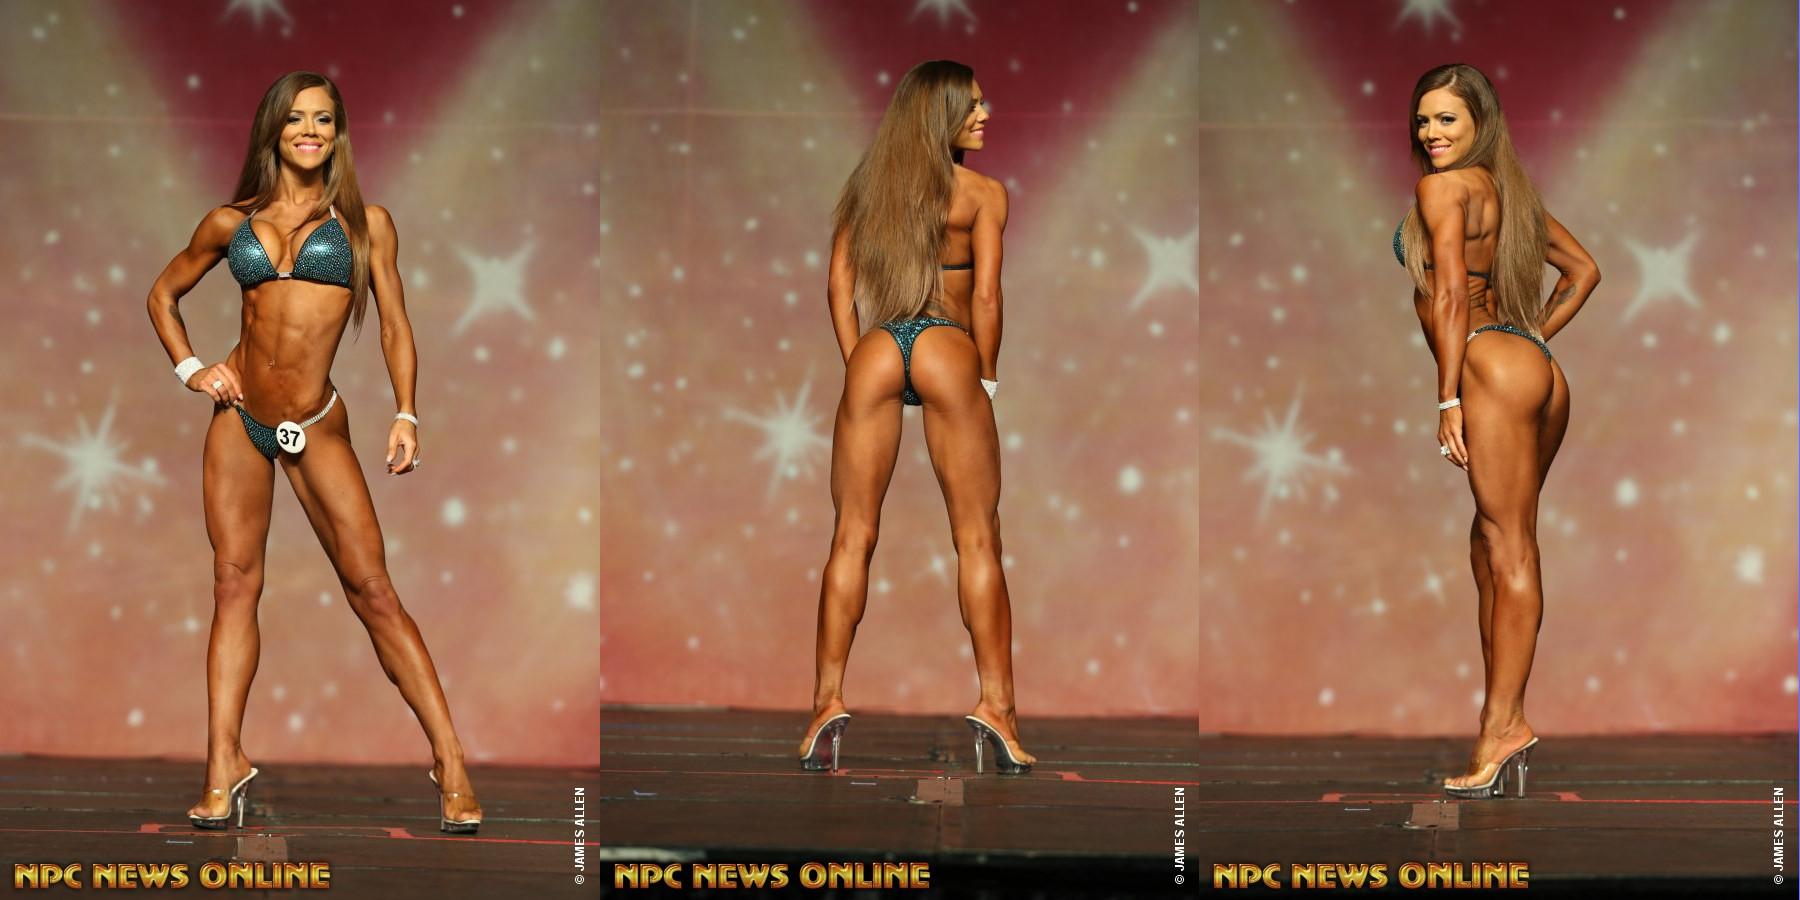 Margret Gnarr - чемпионка Phil Heath Pro - 2016 в категории «бикини»